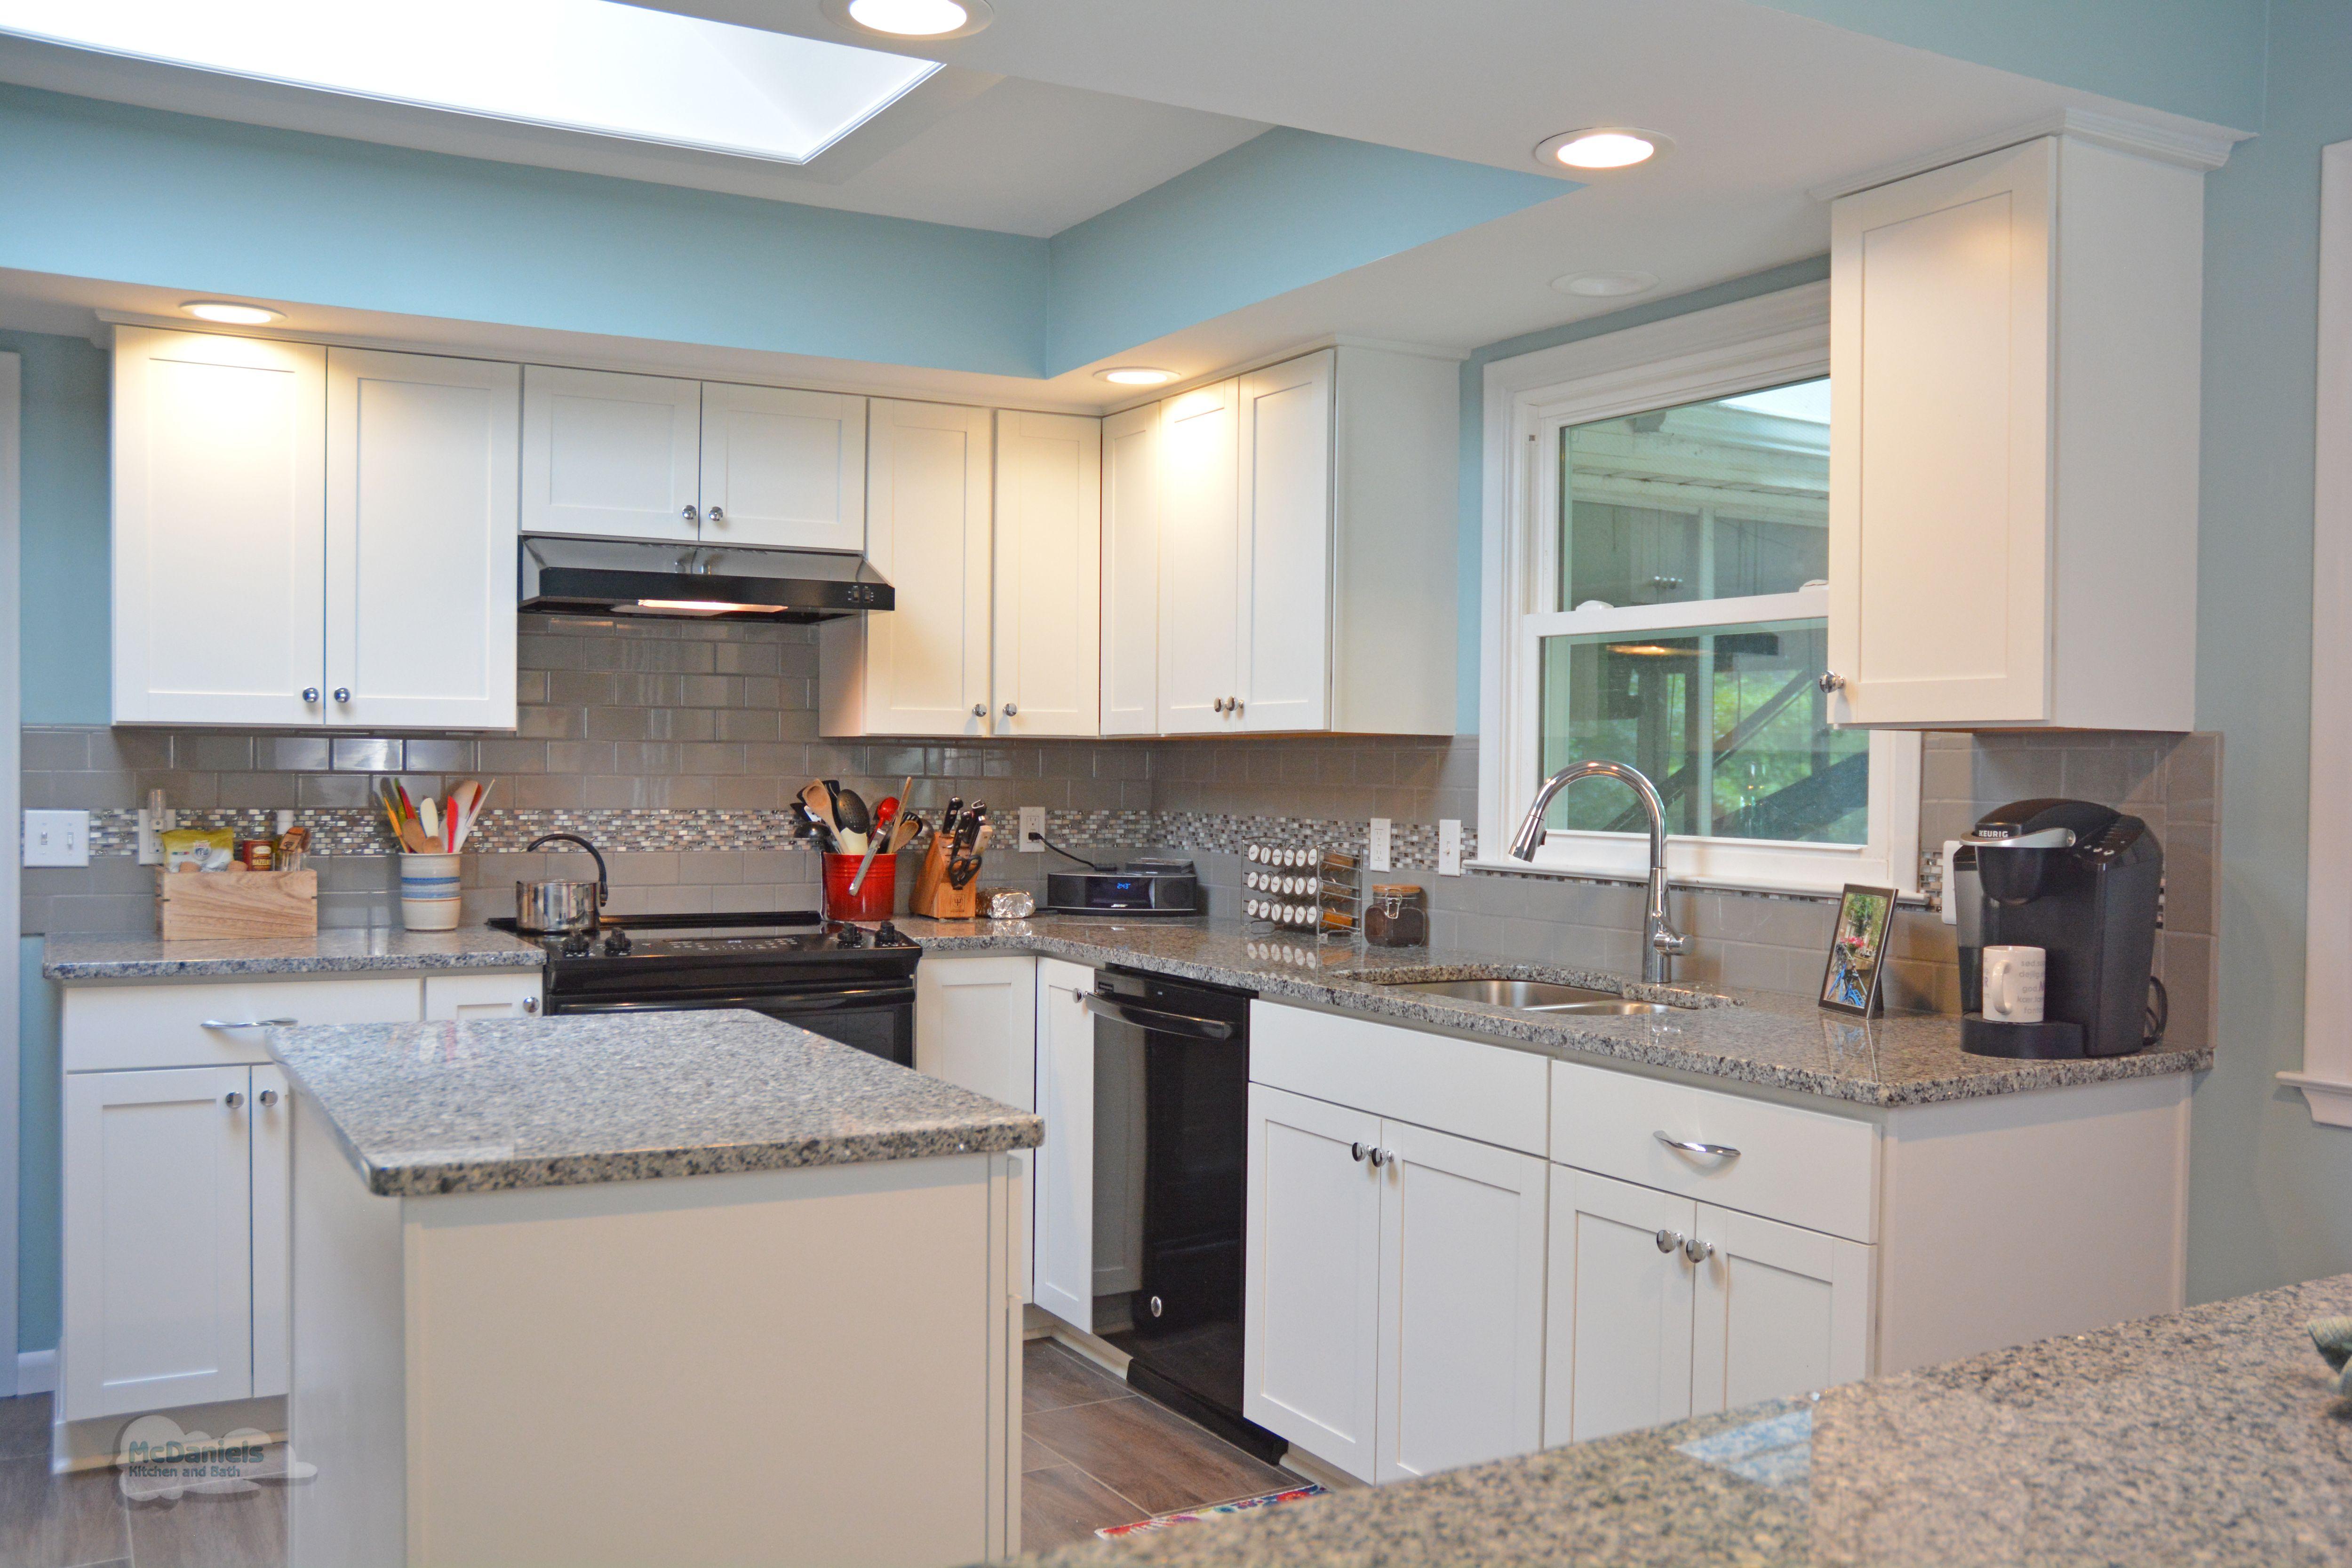 Contact Kitchen Remodel Kitchen Design Kitchen And Bath